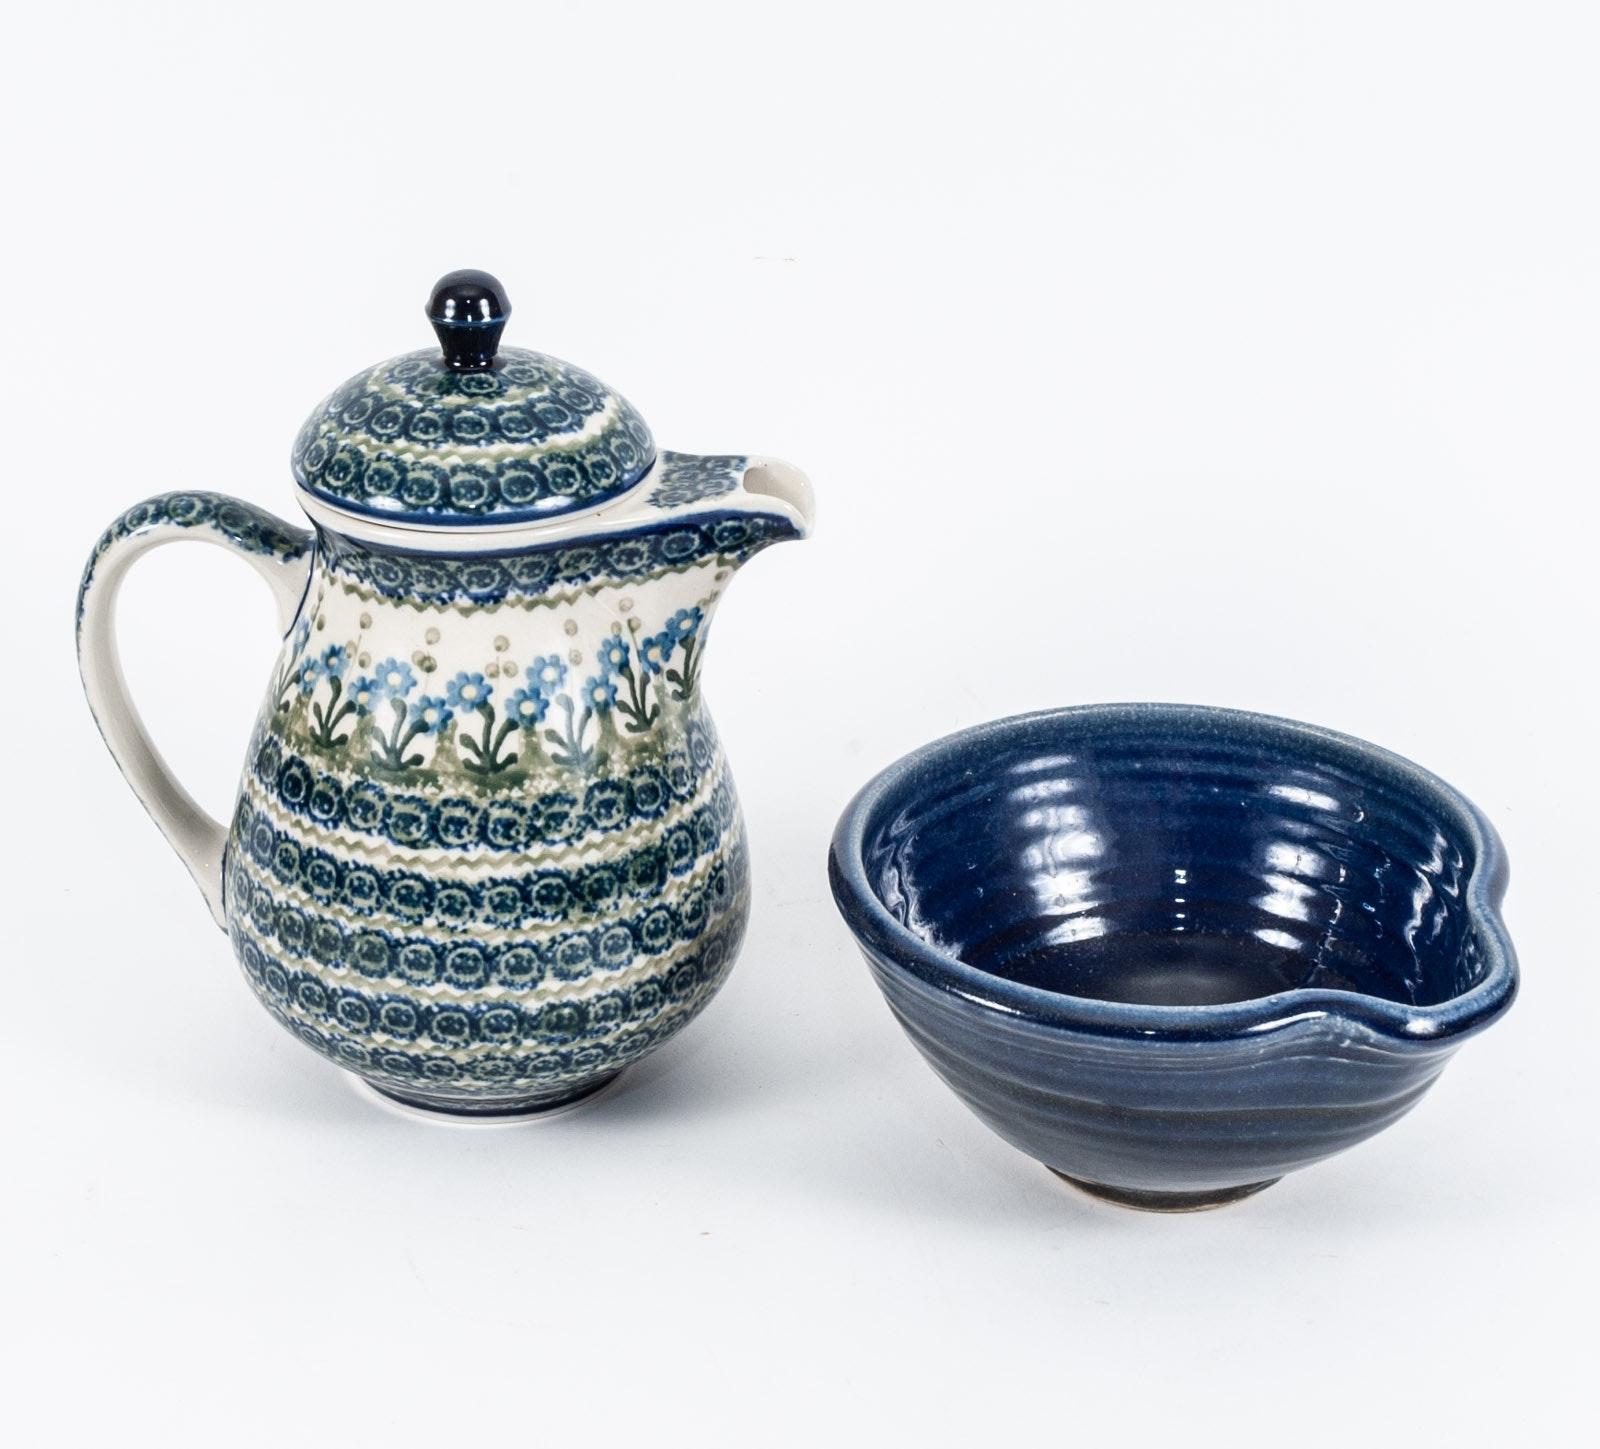 Wheel Thrown Hand-Painted Stoneware Serveware